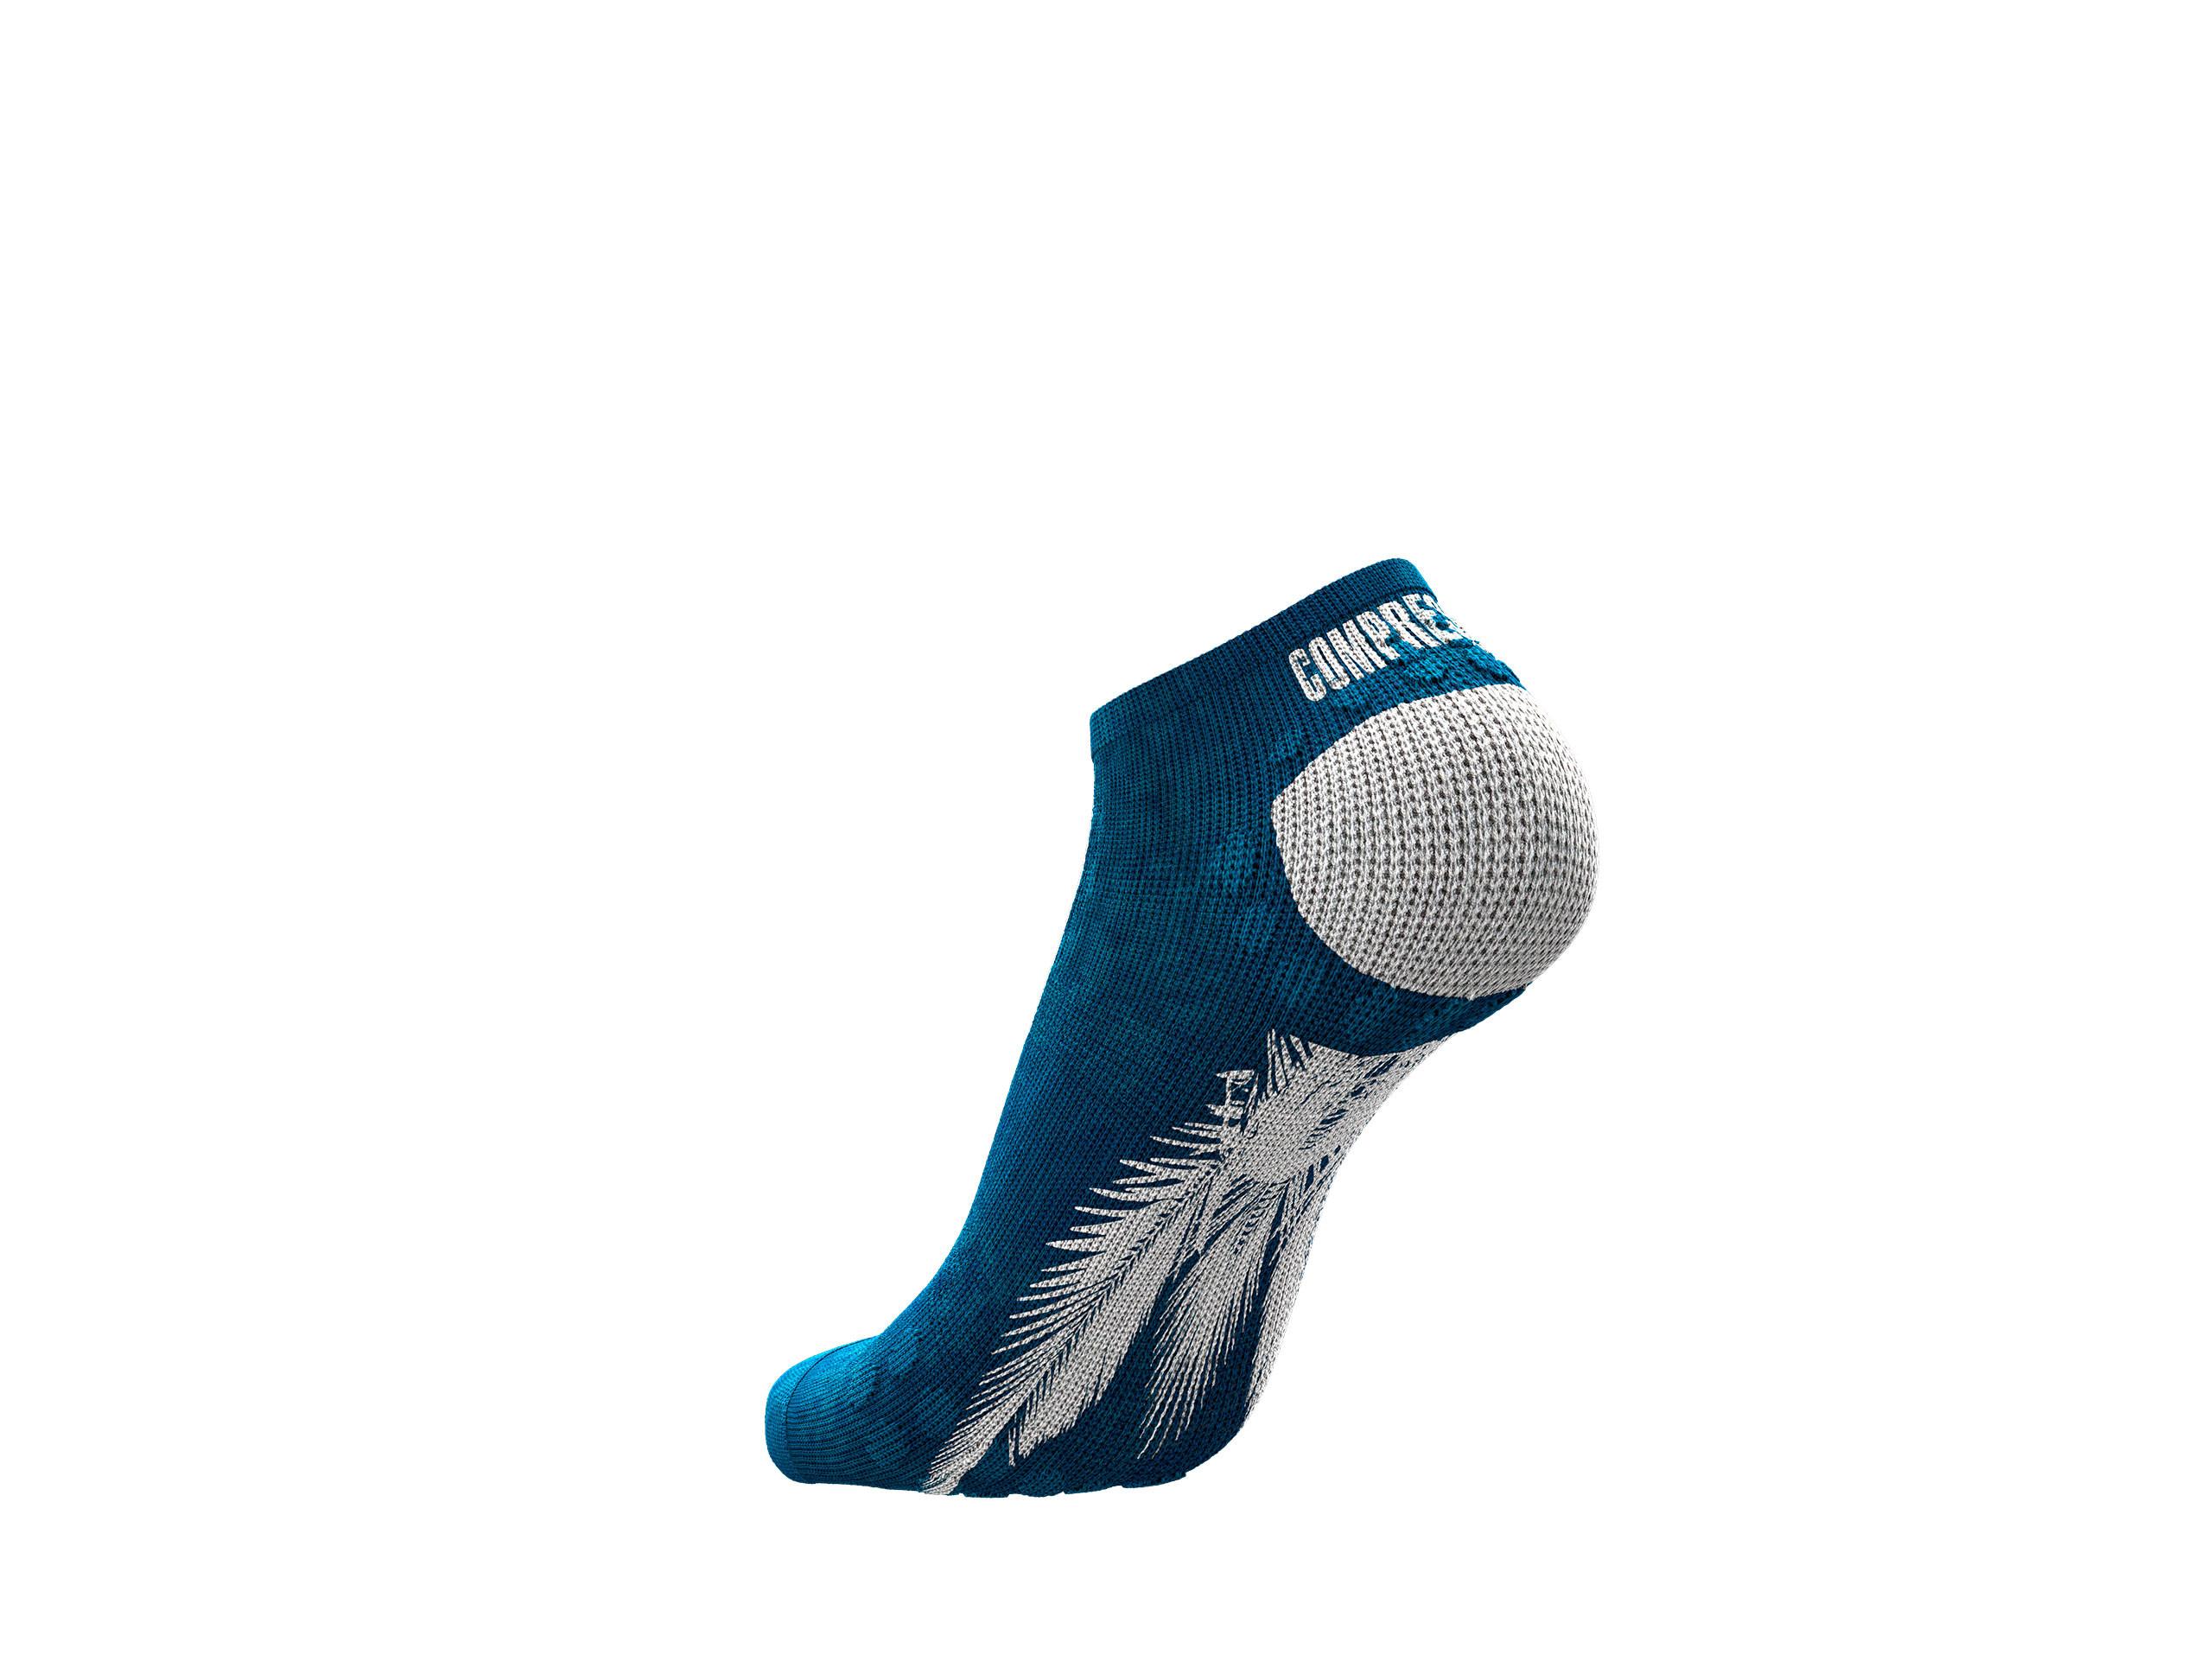 Pro Racing Socks v3.0 Ultralight Run Low - Kona 2019 BLUE